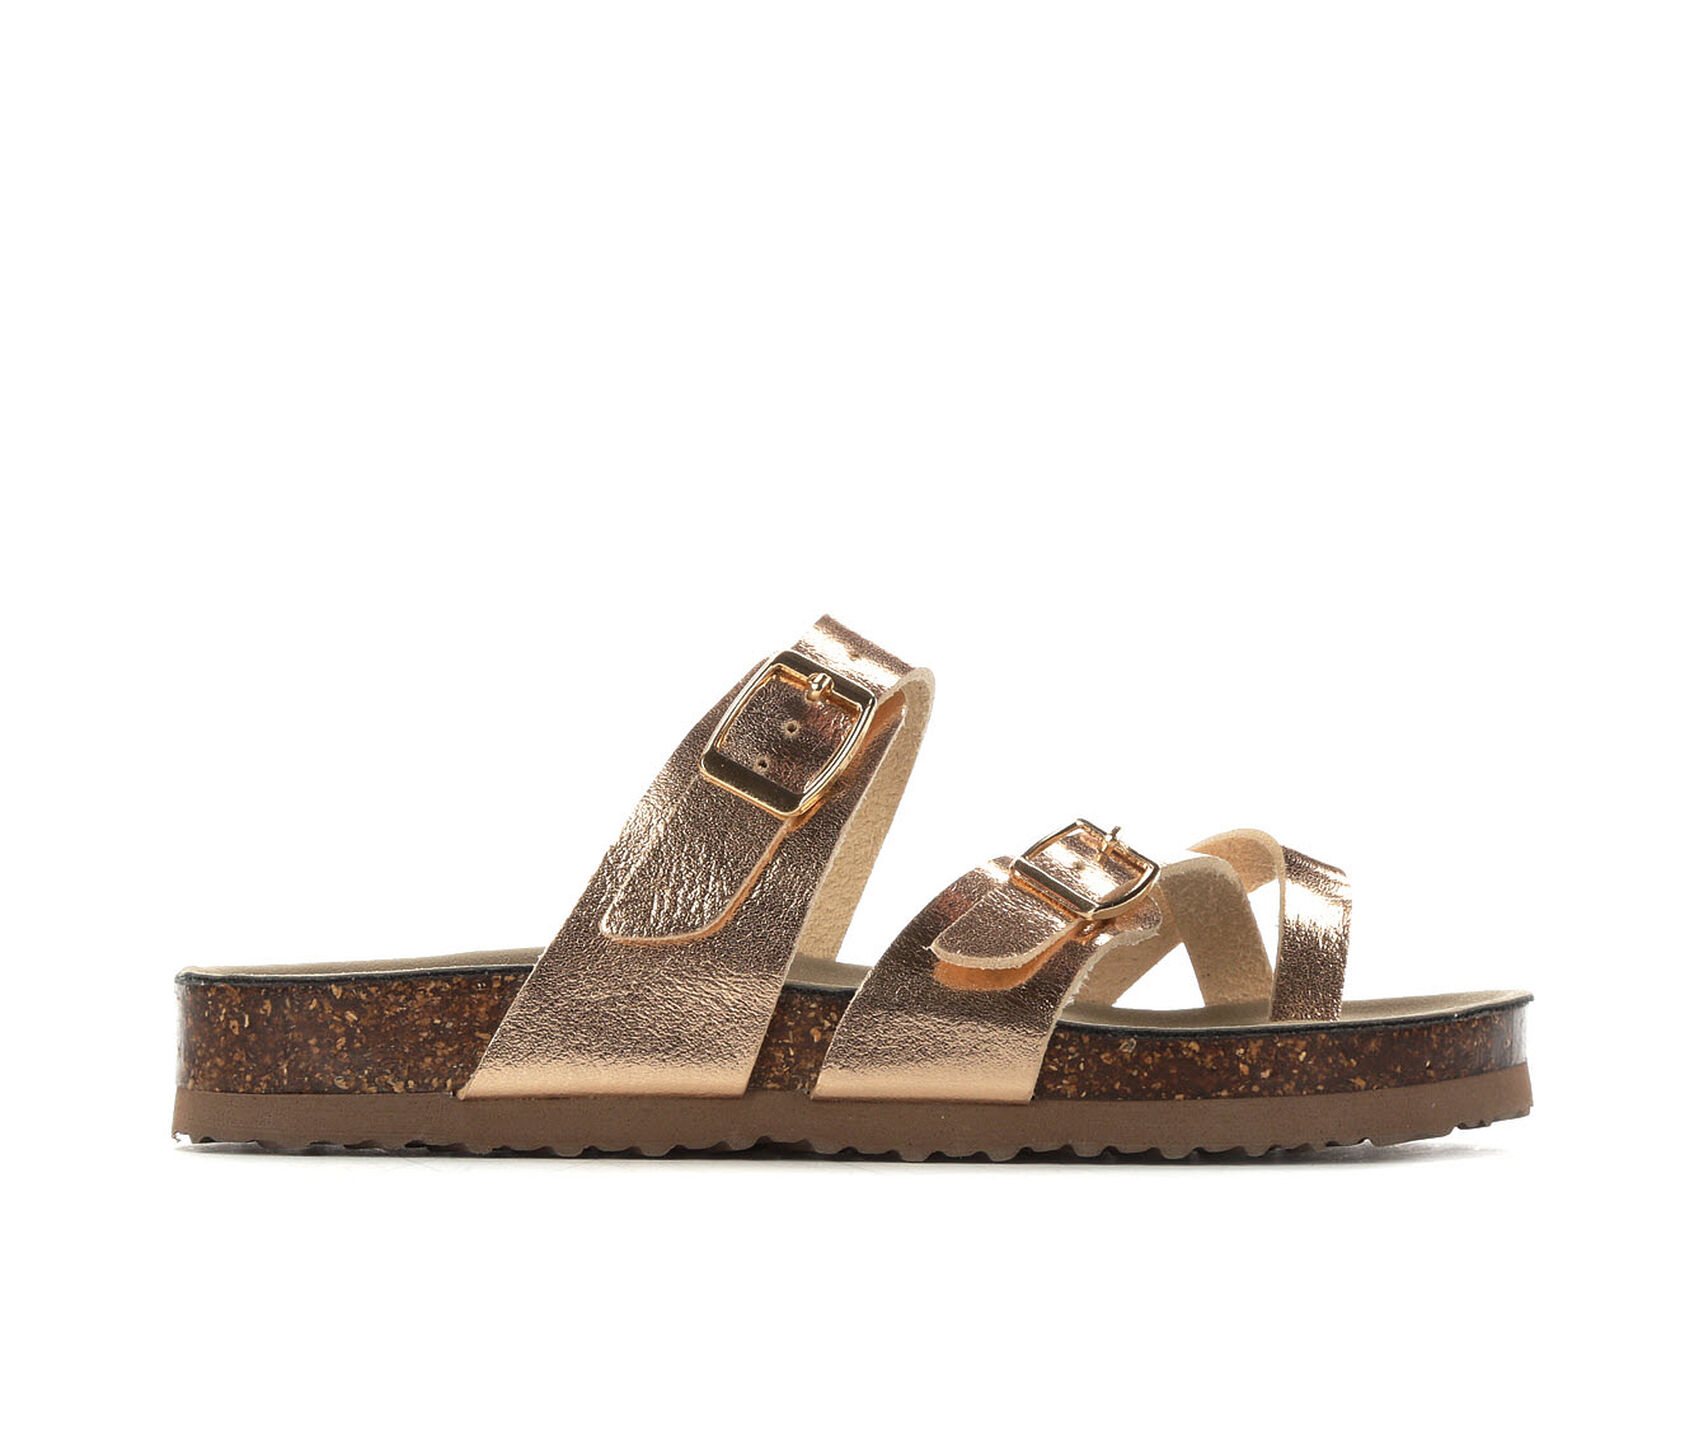 774d27319b1 Girls' Madden Girl Little Kid & Big Kid JBryceee Strappy Footbed Sandals